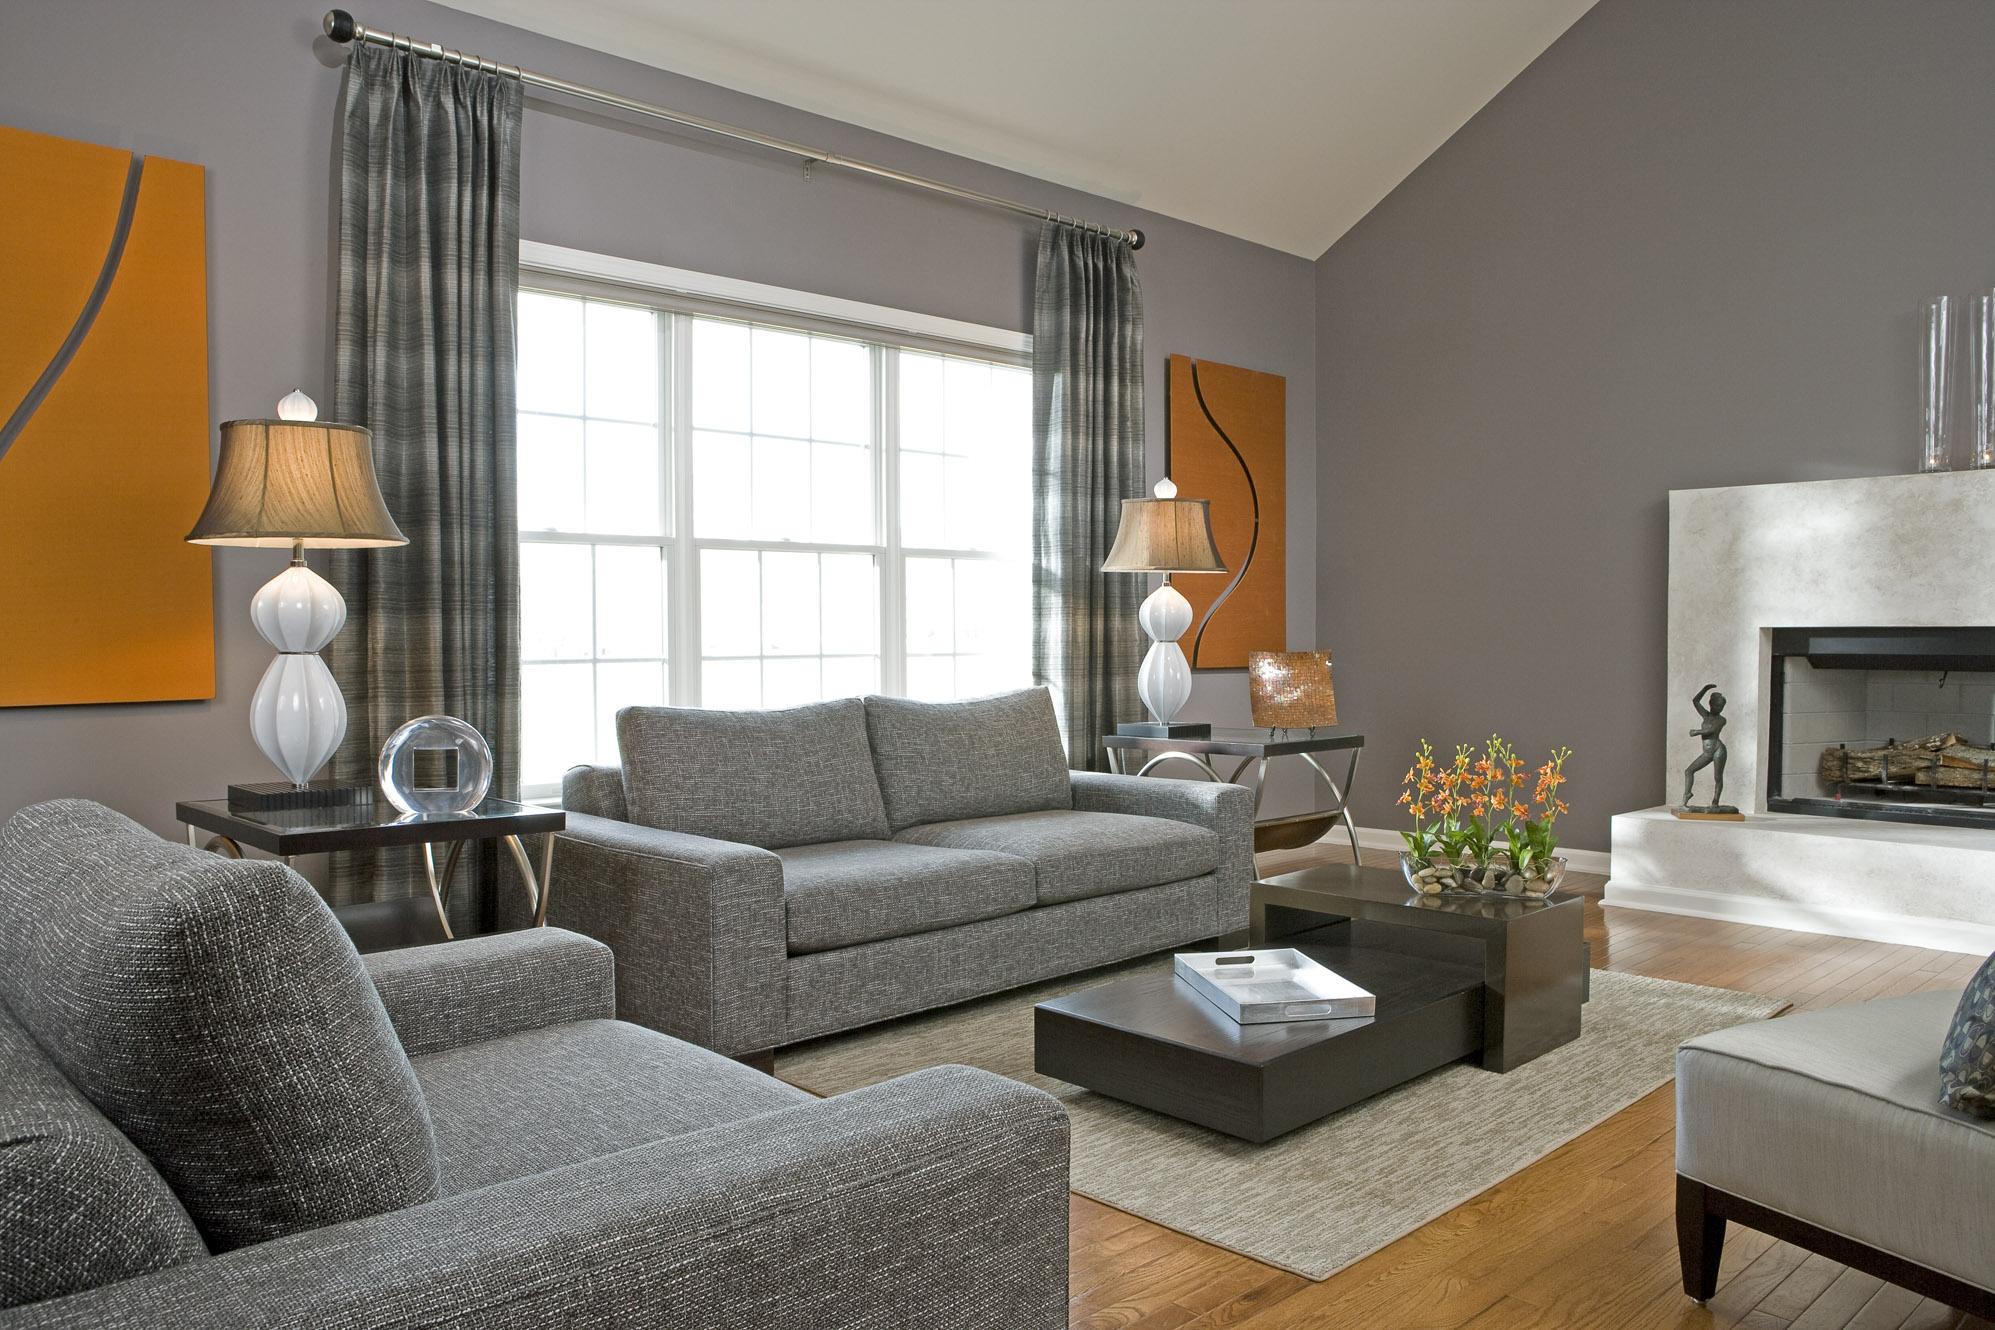 Best Interiors By Decorating Den Photos - Liltigertoo.com ...